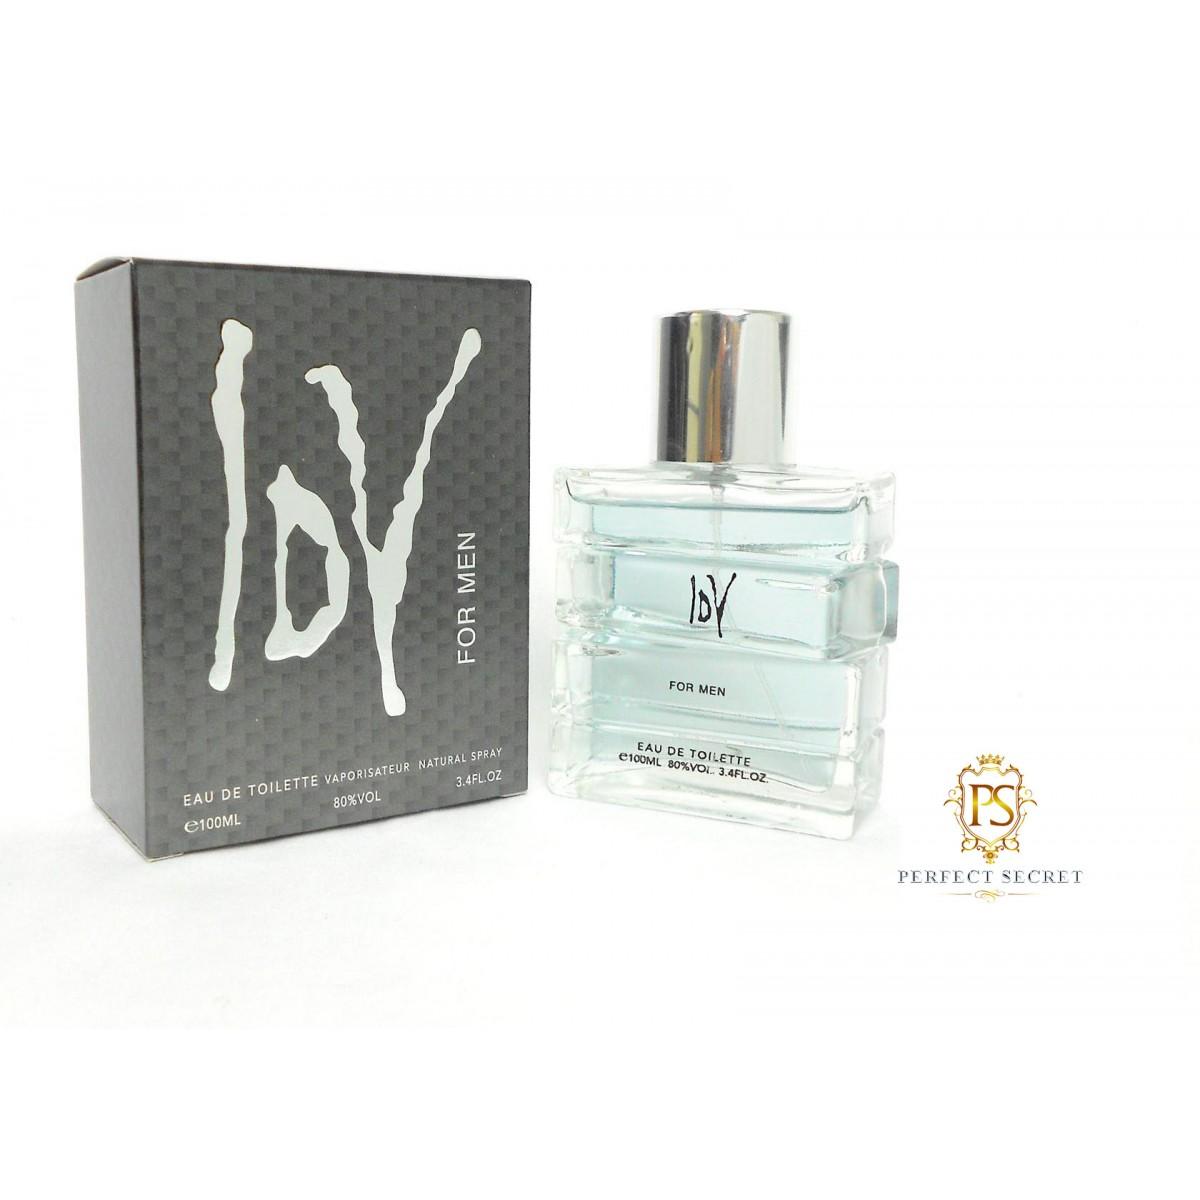 IDY Perfume